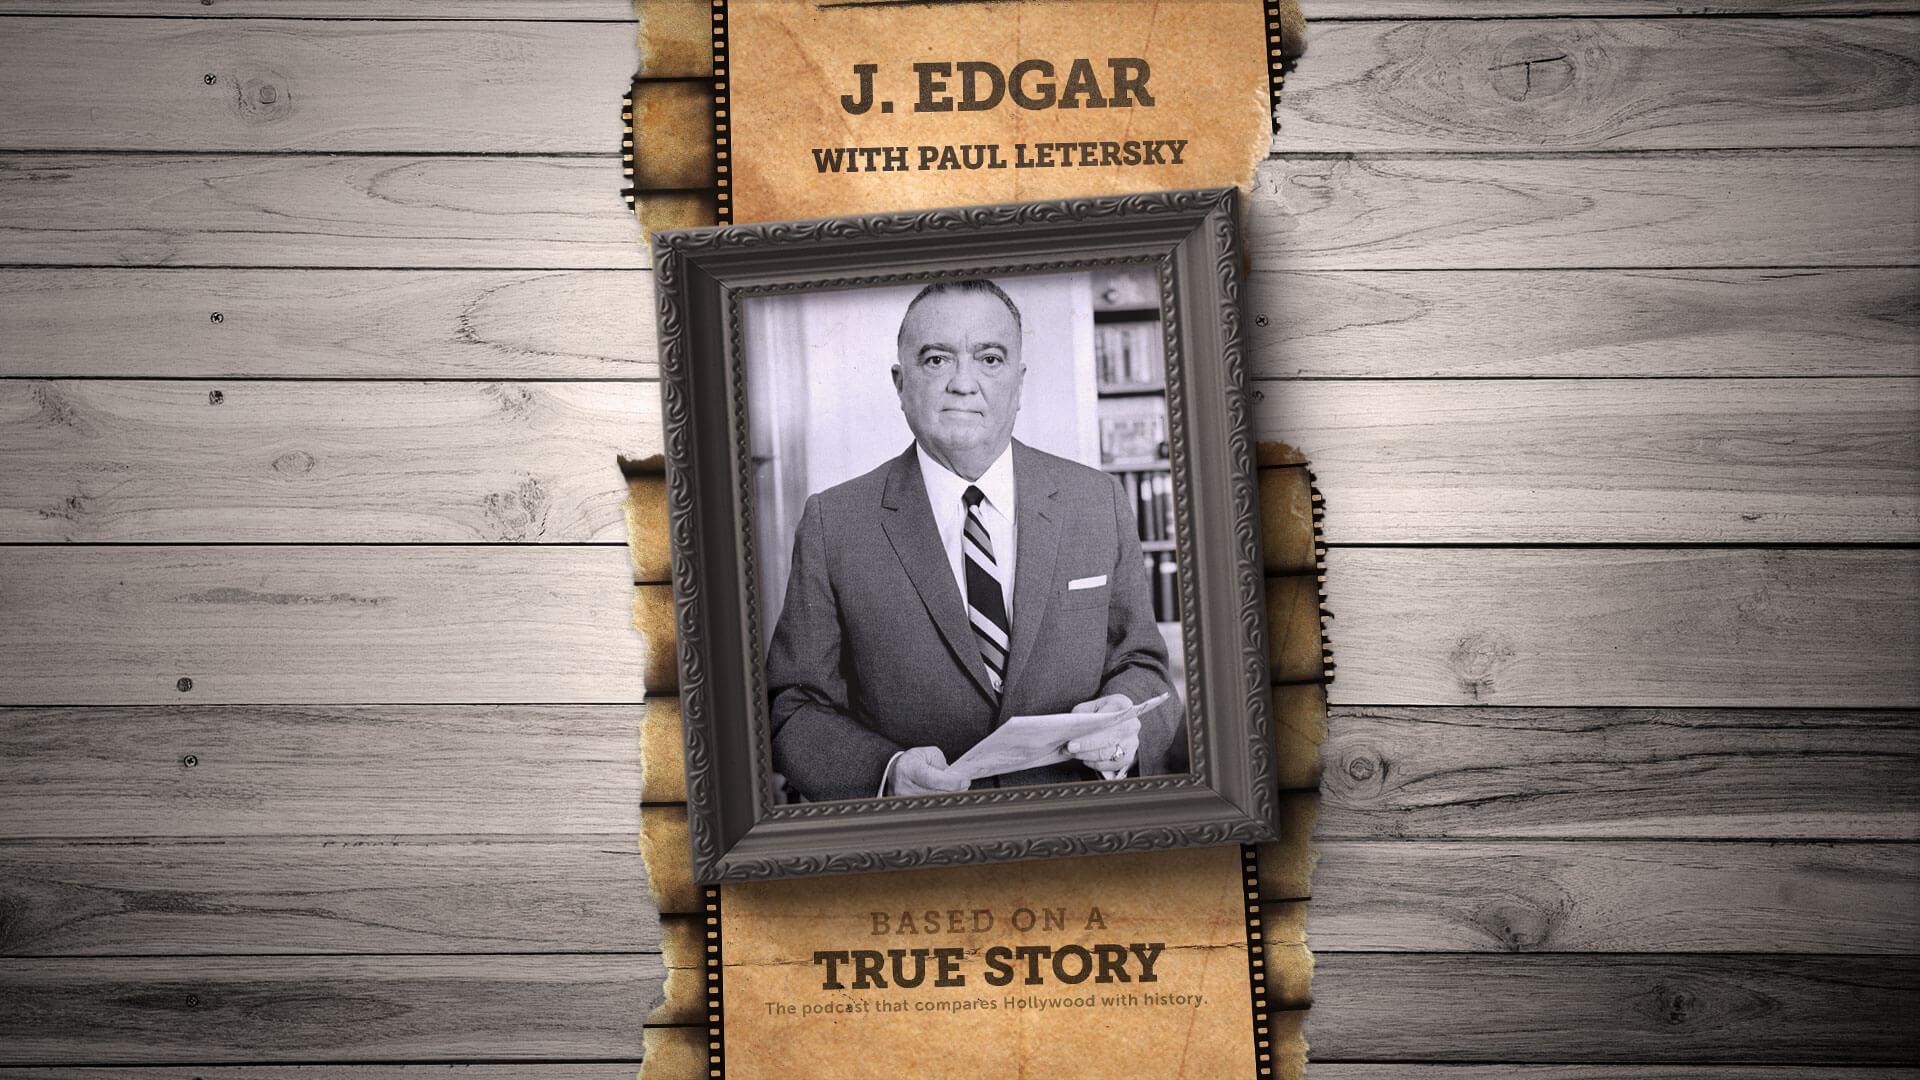 The true story of J. Edgar Hoover